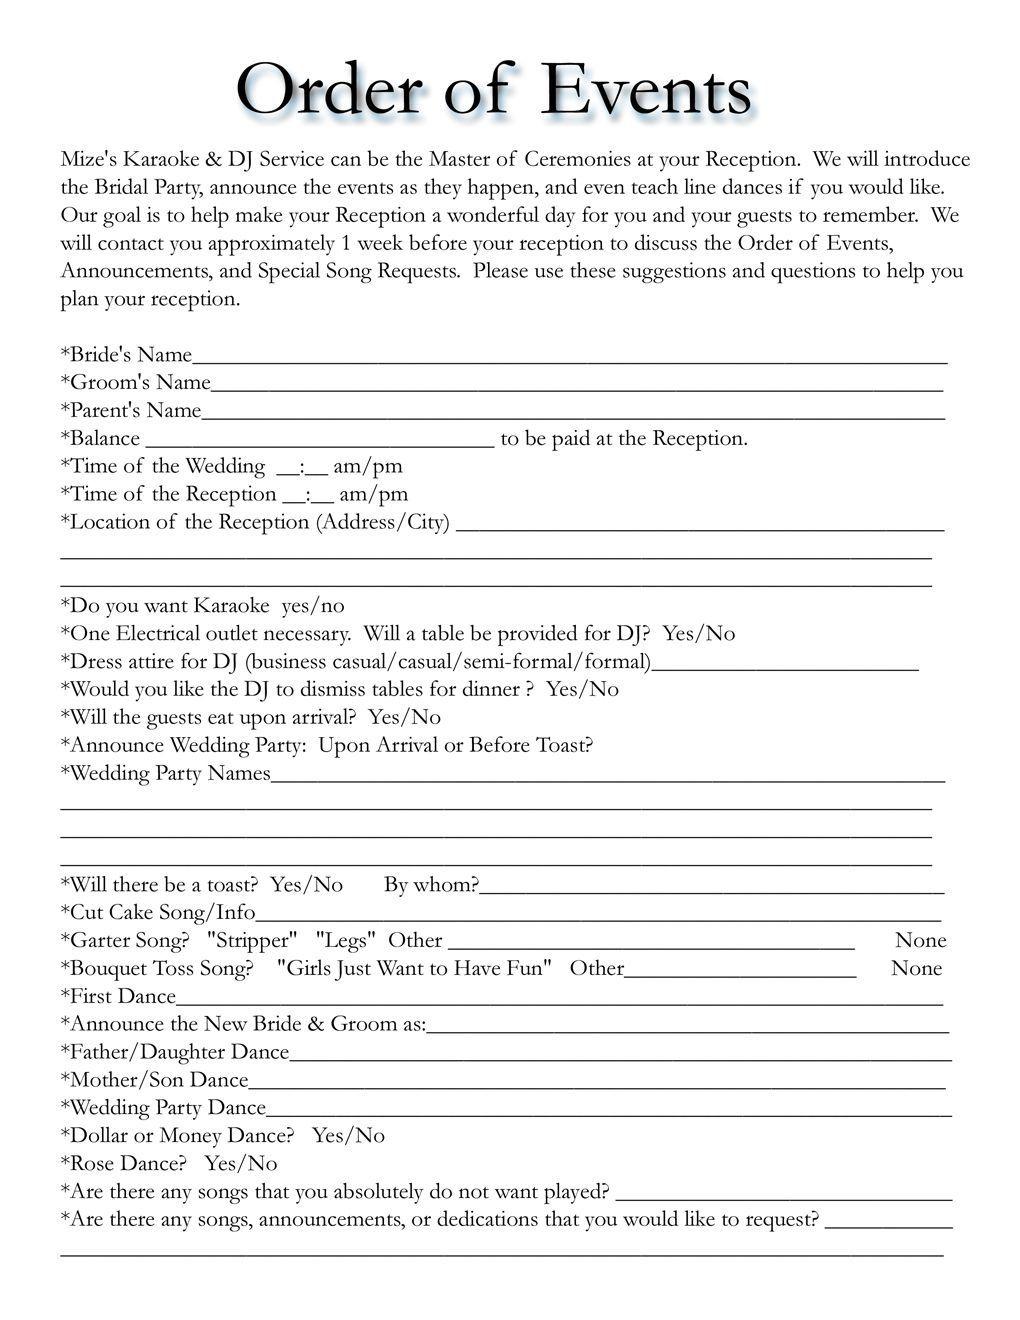 002 Formidable Wedding Timeline Template Free Sample  Day Excel ProgramFull